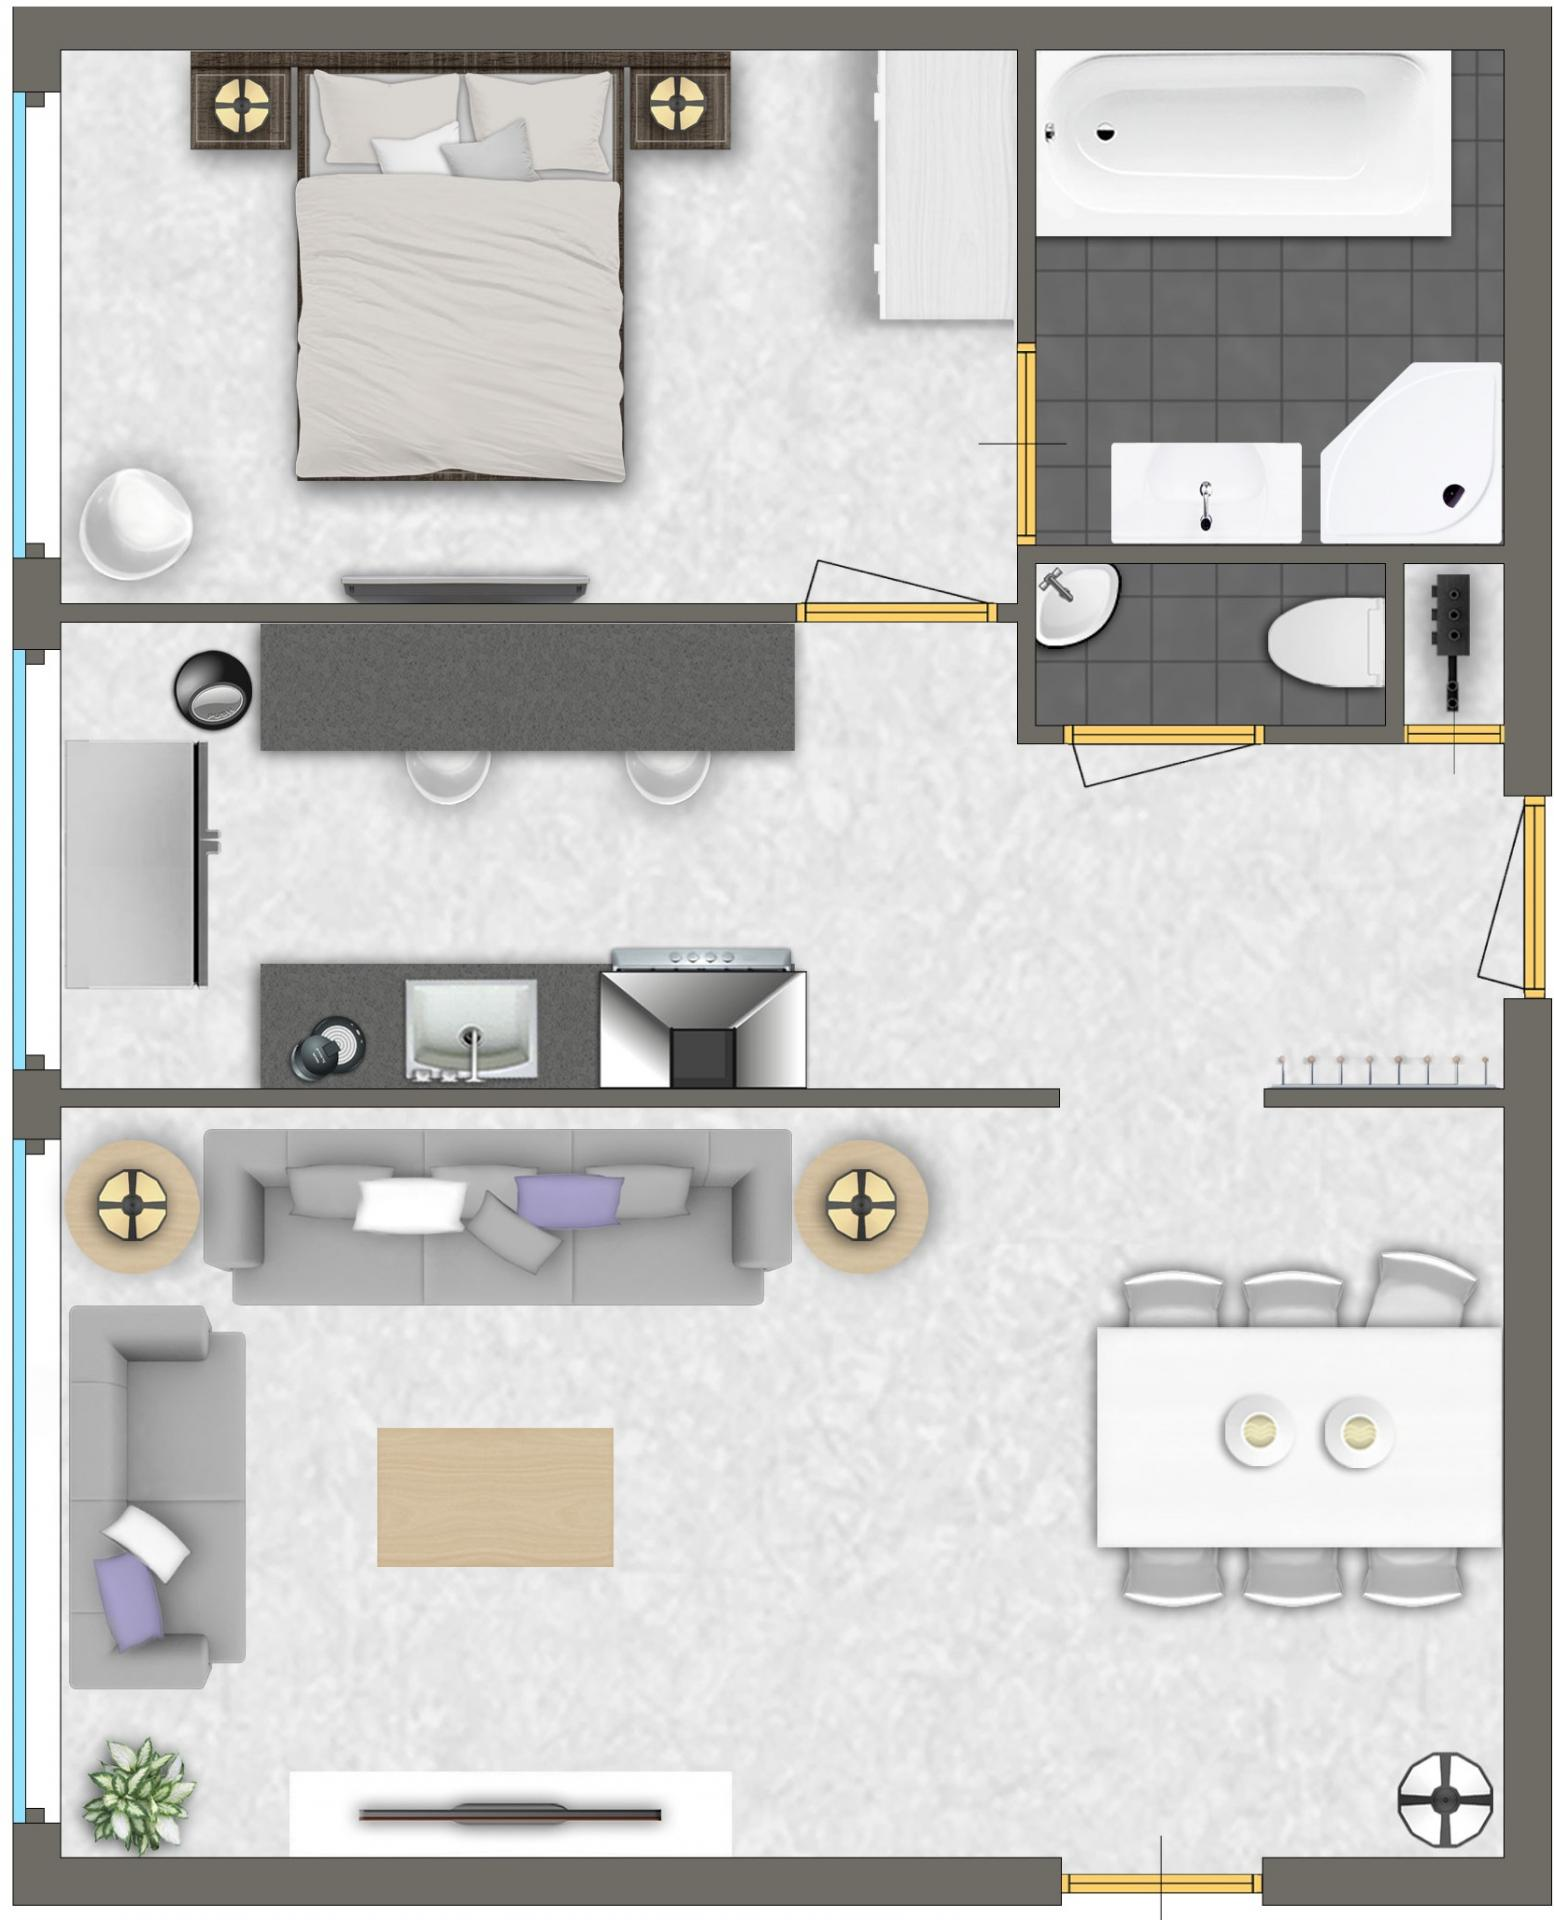 1 bed floor plan at Htel Amsterdam Buitenveldert